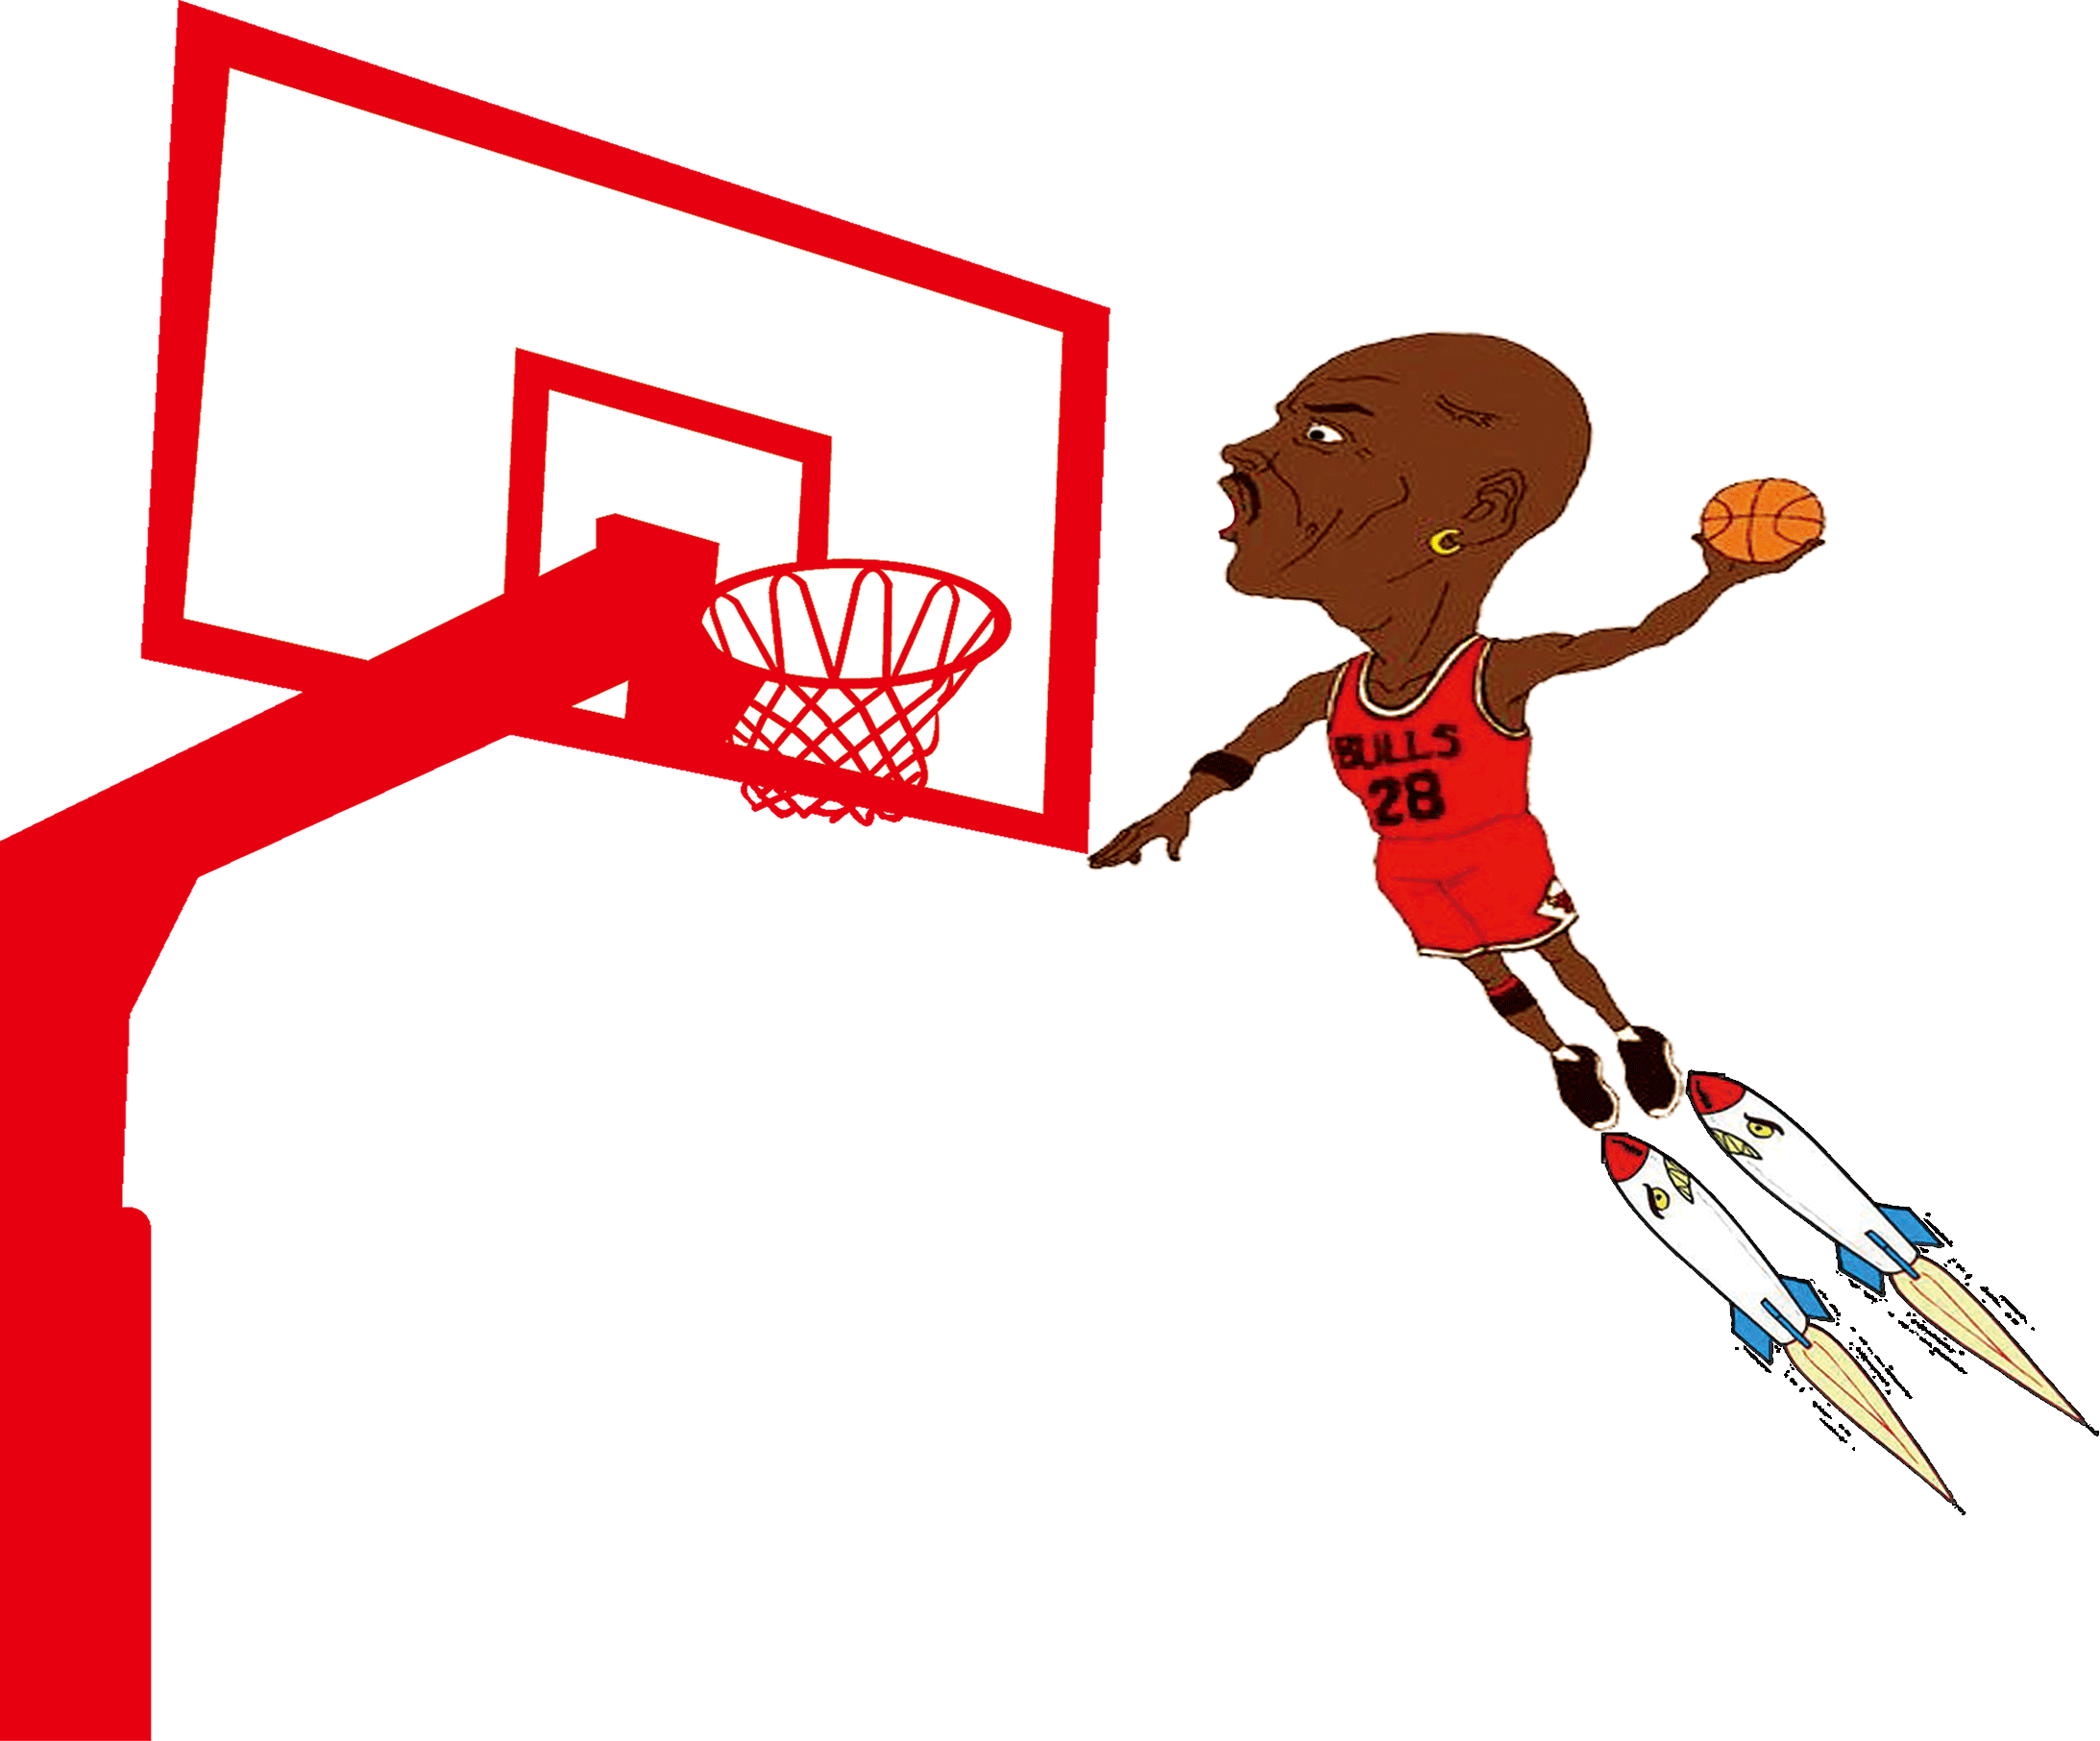 Olympics basketball clipart svg Basketball National Games of China 2020 Summer Olympics Wall decal ... svg